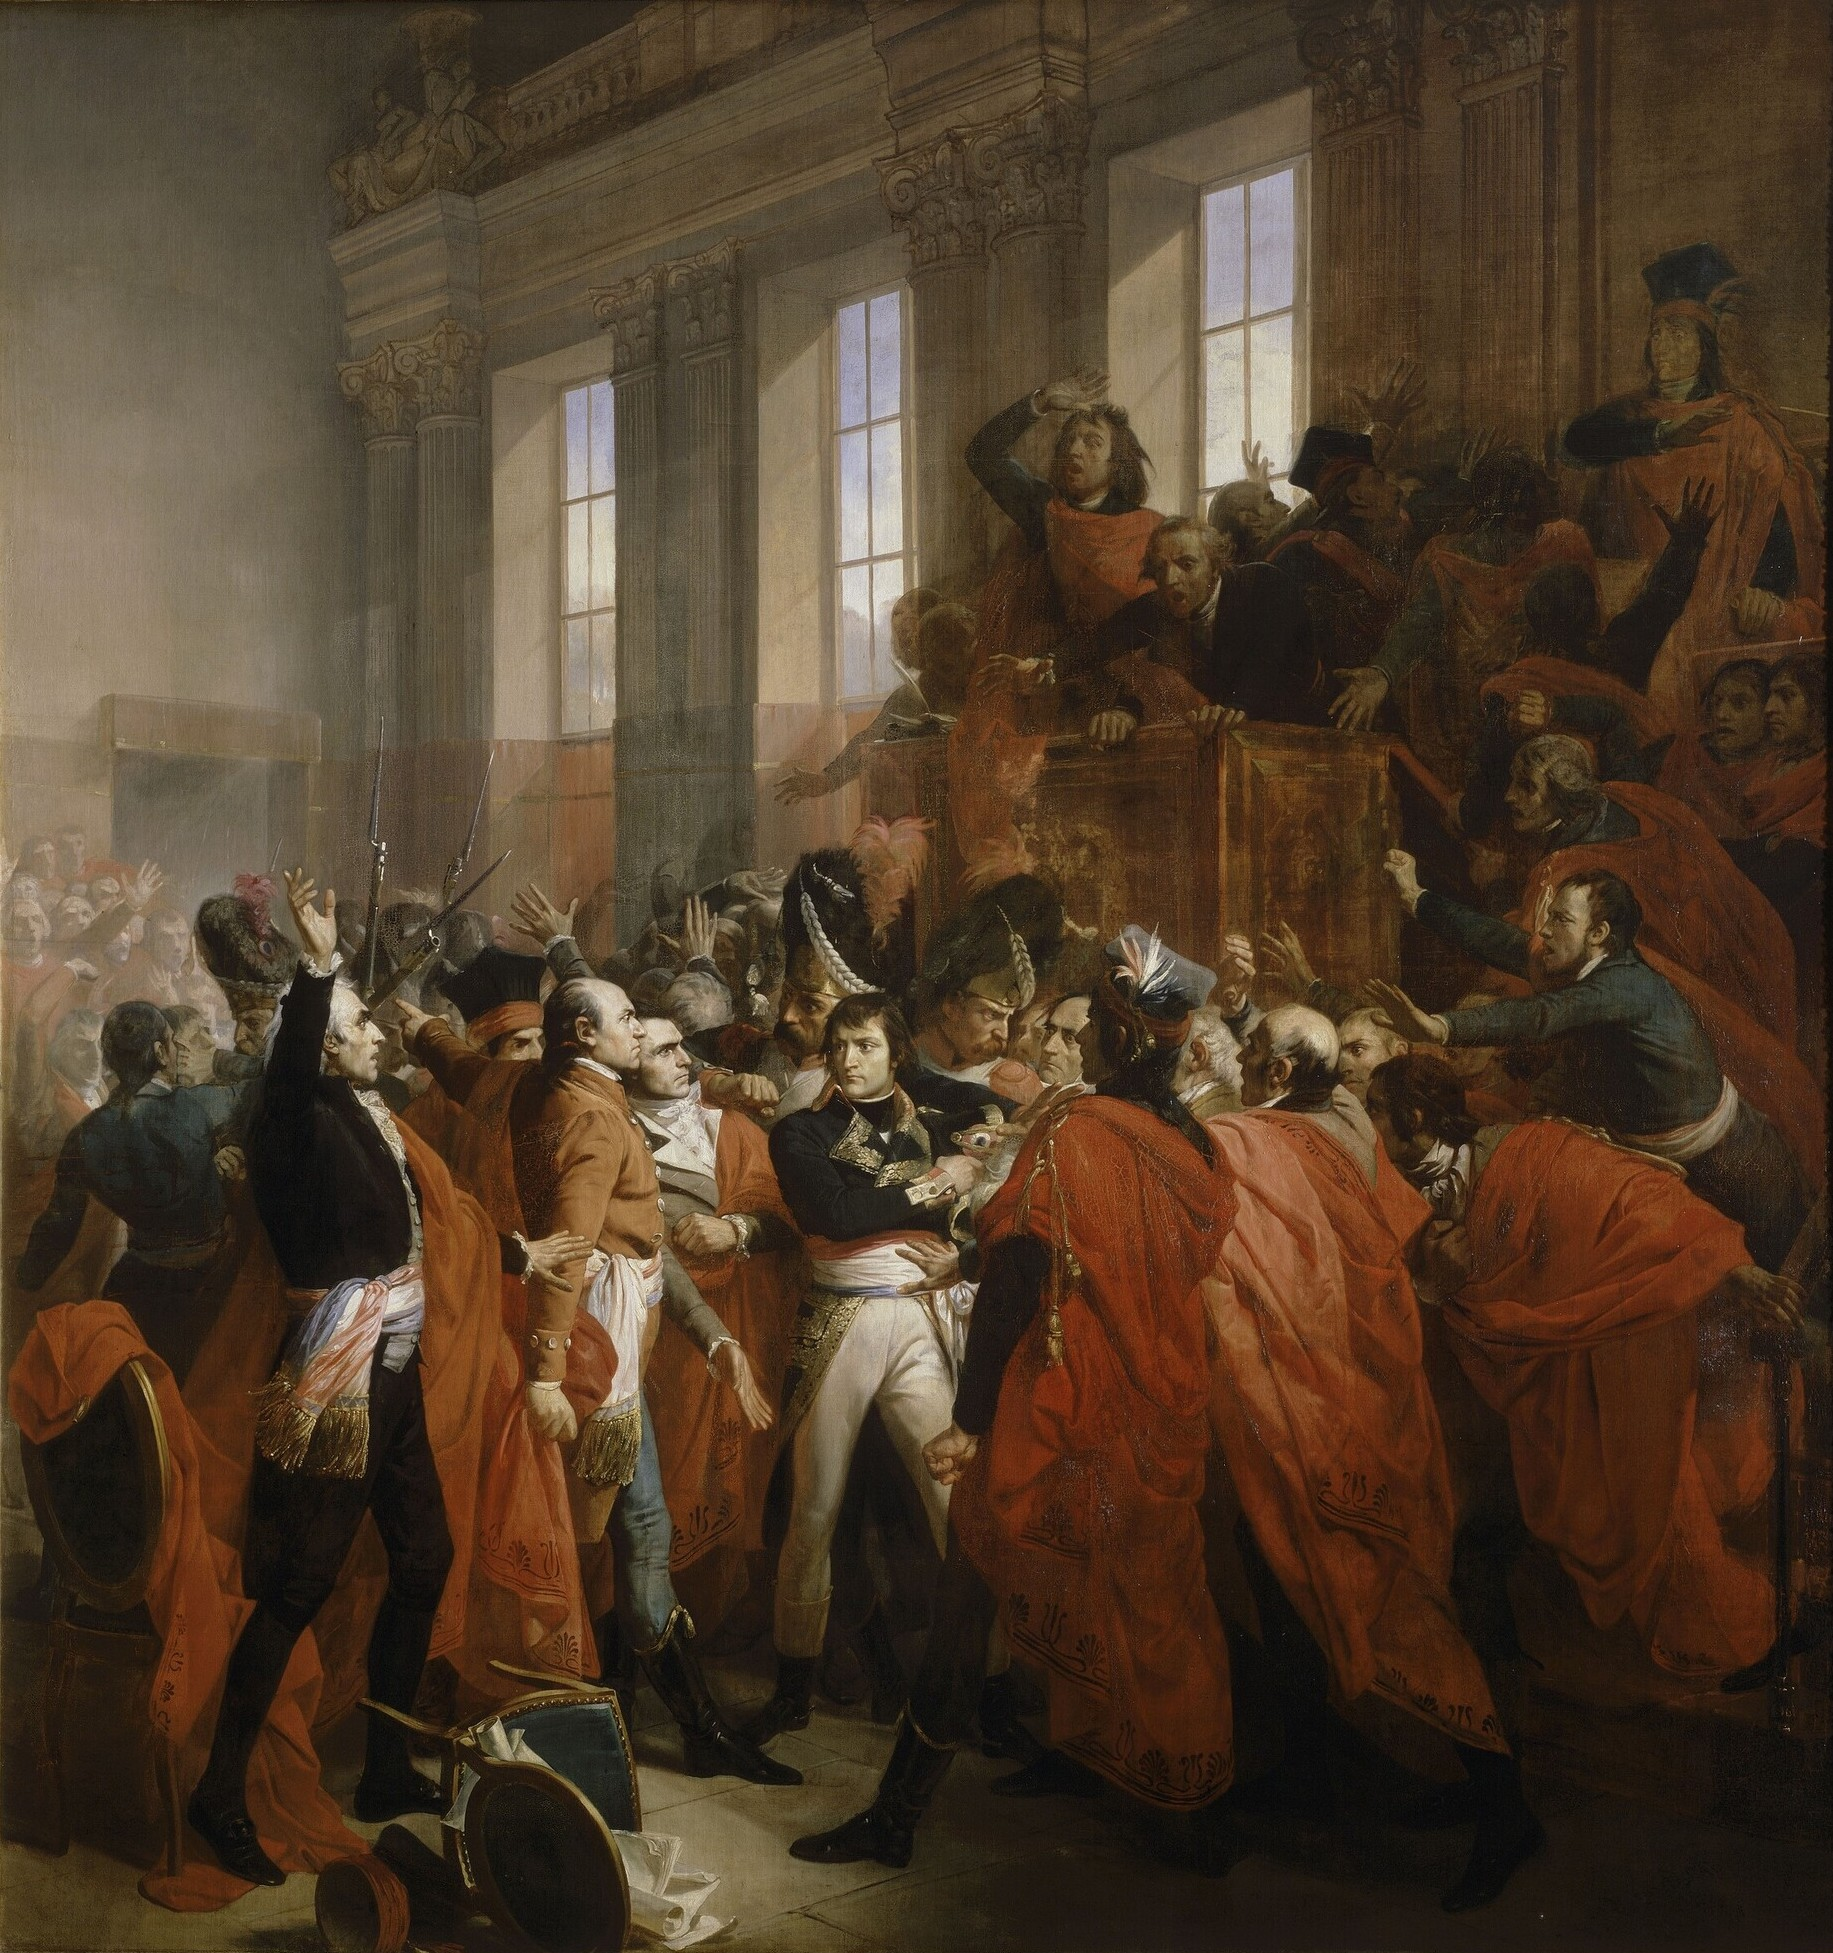 The coup of 18 Brumaire. François Bouchot (1800-1842).